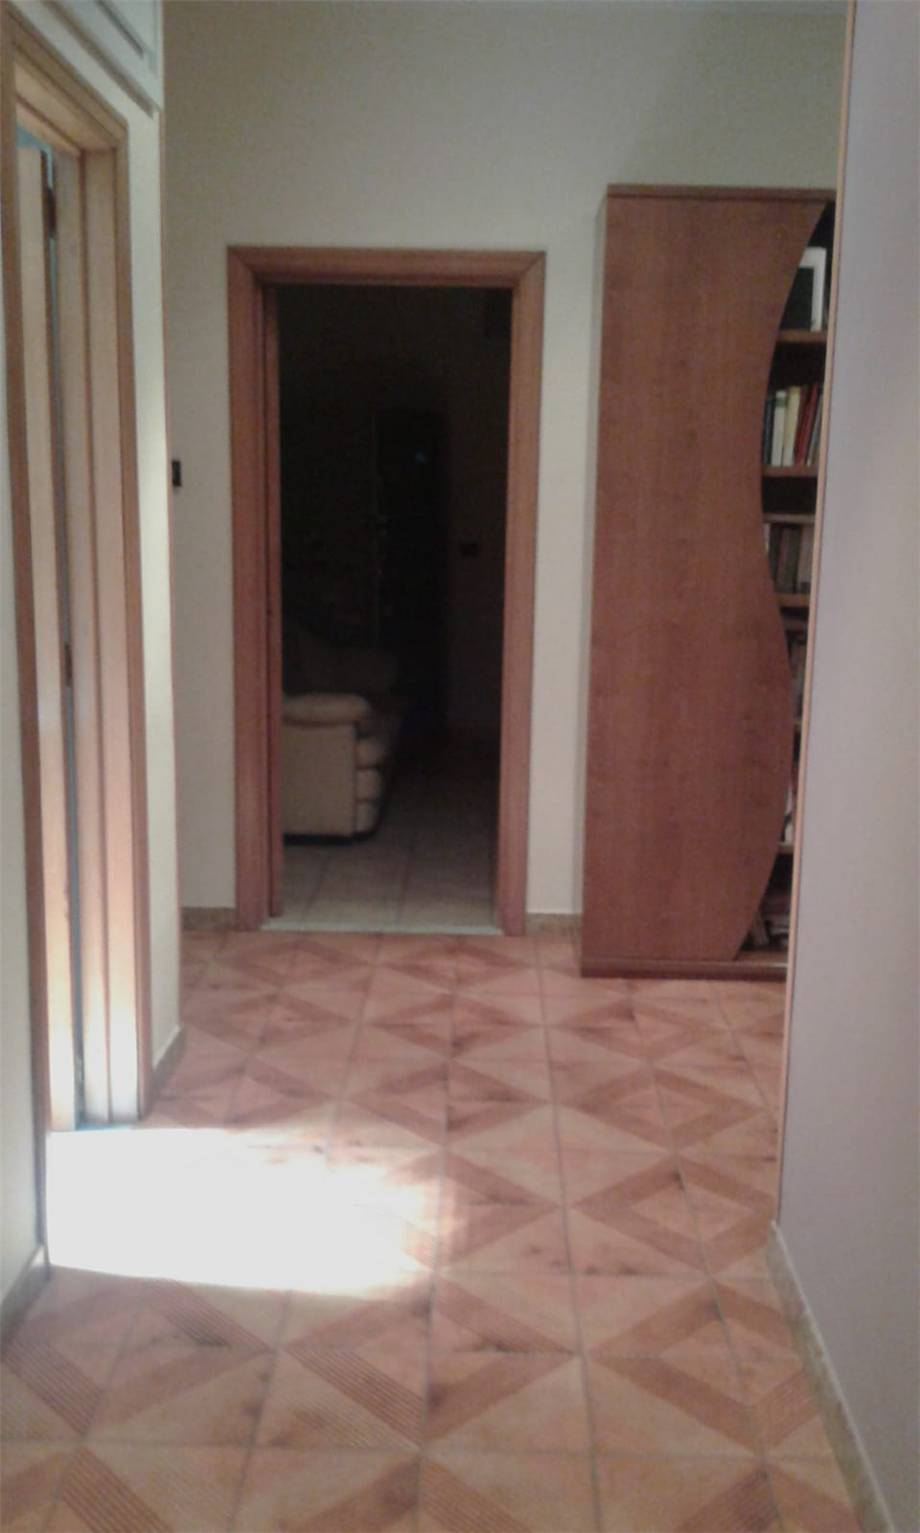 Vendita Villa/Casa singola Rosolini  #31C n.5